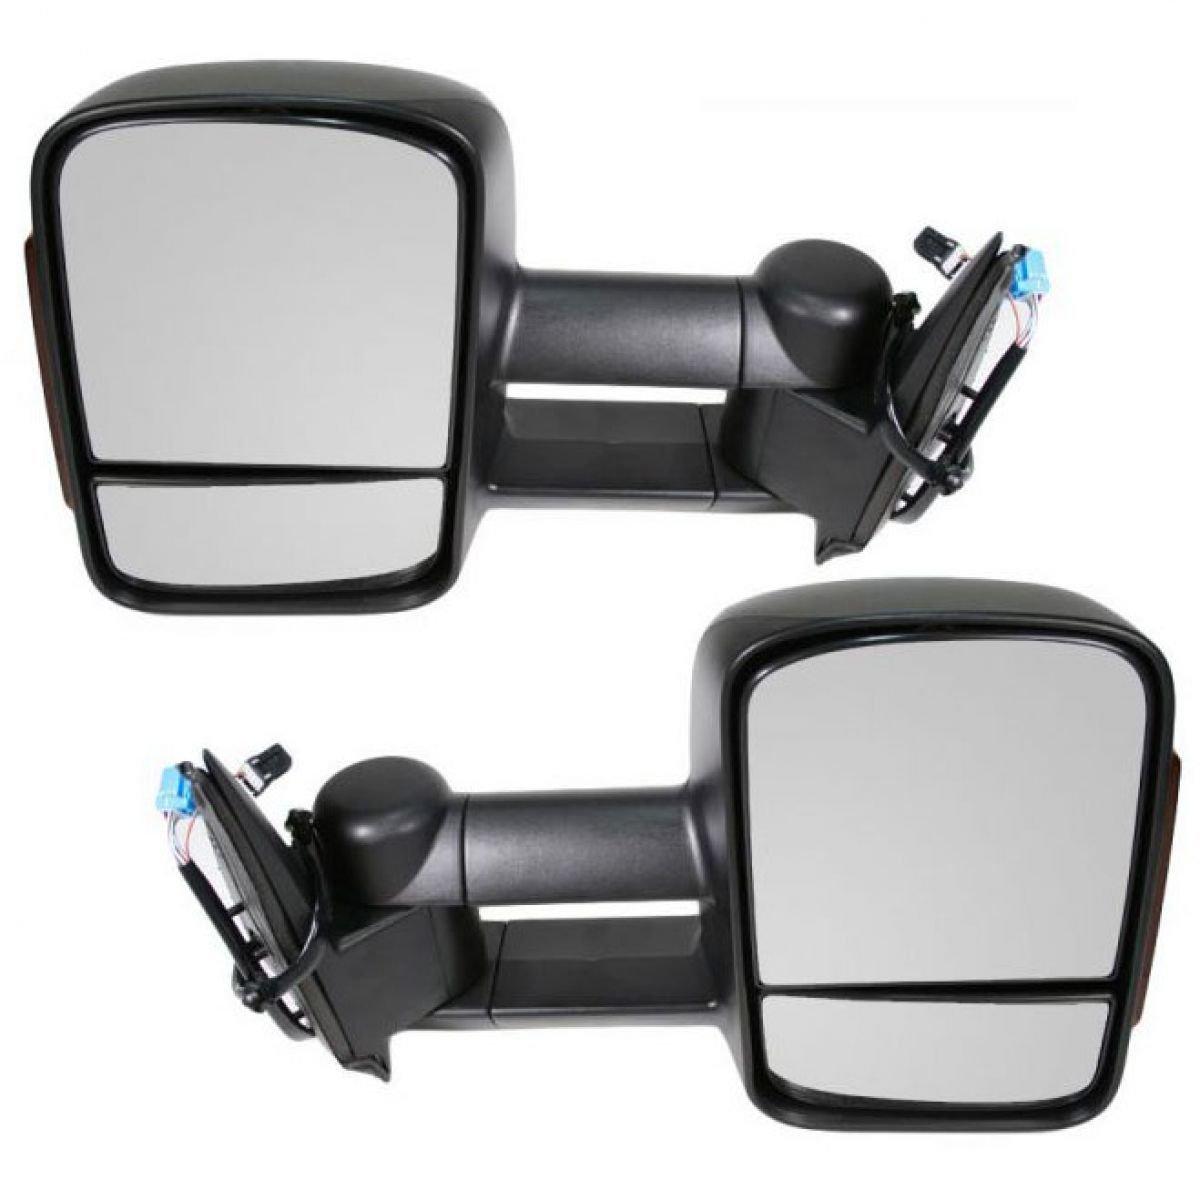 Amazon.com: Towing Mirrors 2003-2007 Chevy/GMC Silverado/Sierra ...